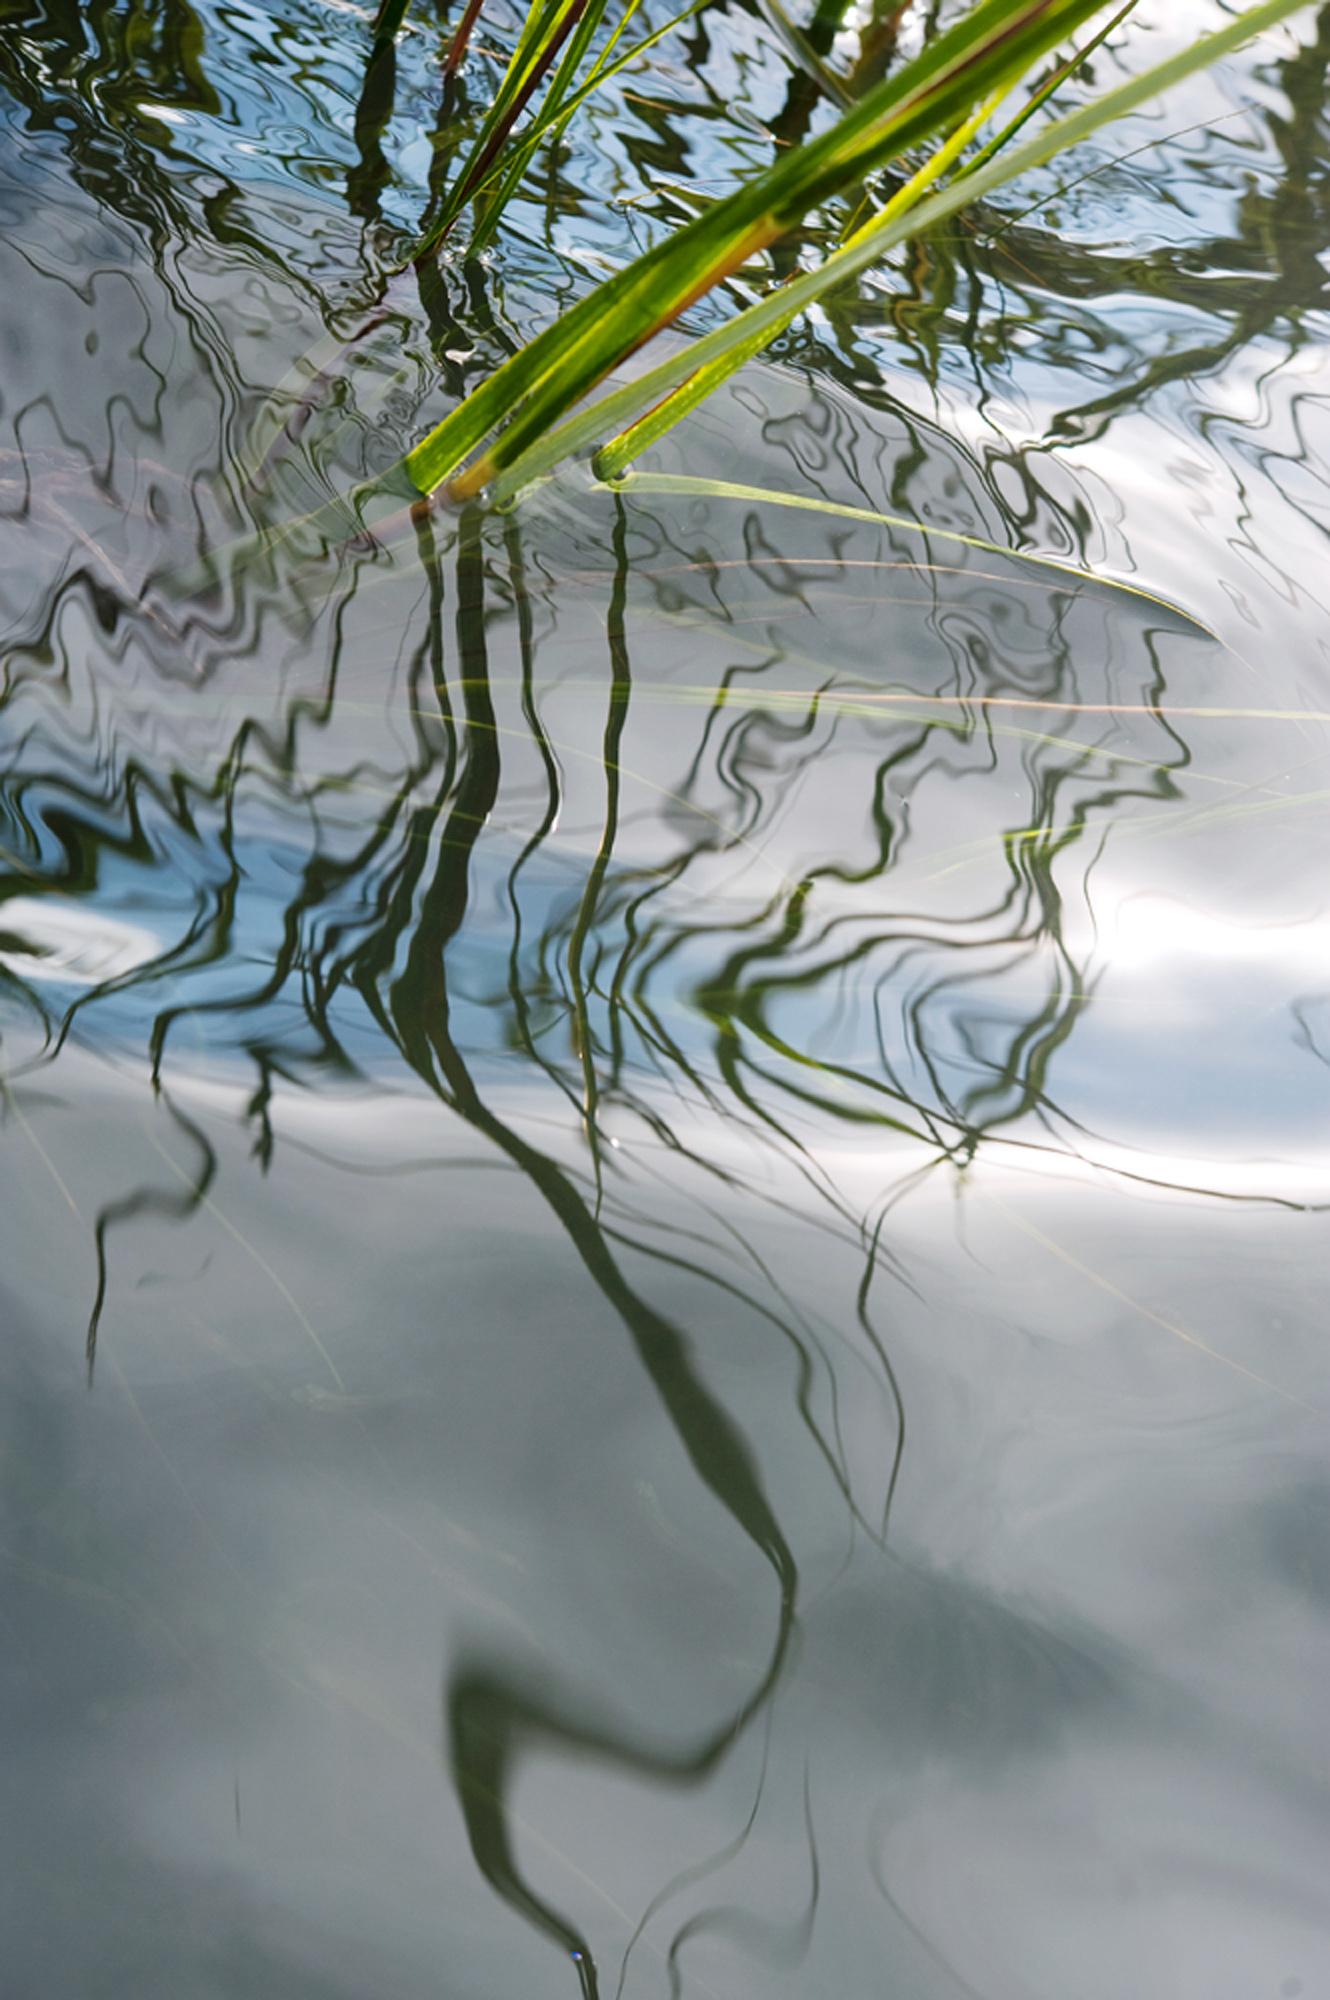 Linear Veil III, 2012 (Touching the Farm River)